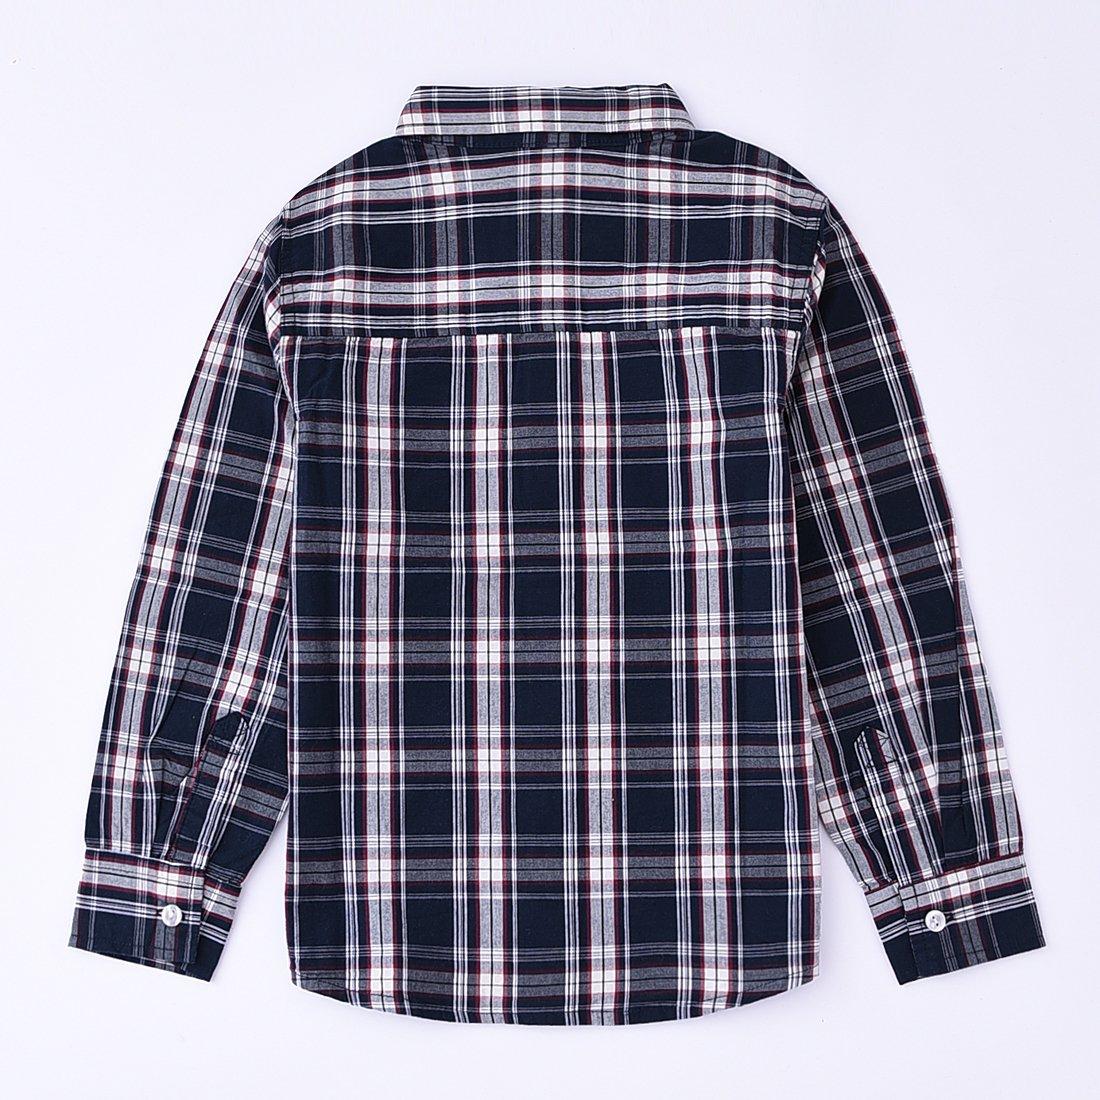 MOMOLAND Toddler Boys Long Sleeve Button Down Woven Plaid Check Shirts